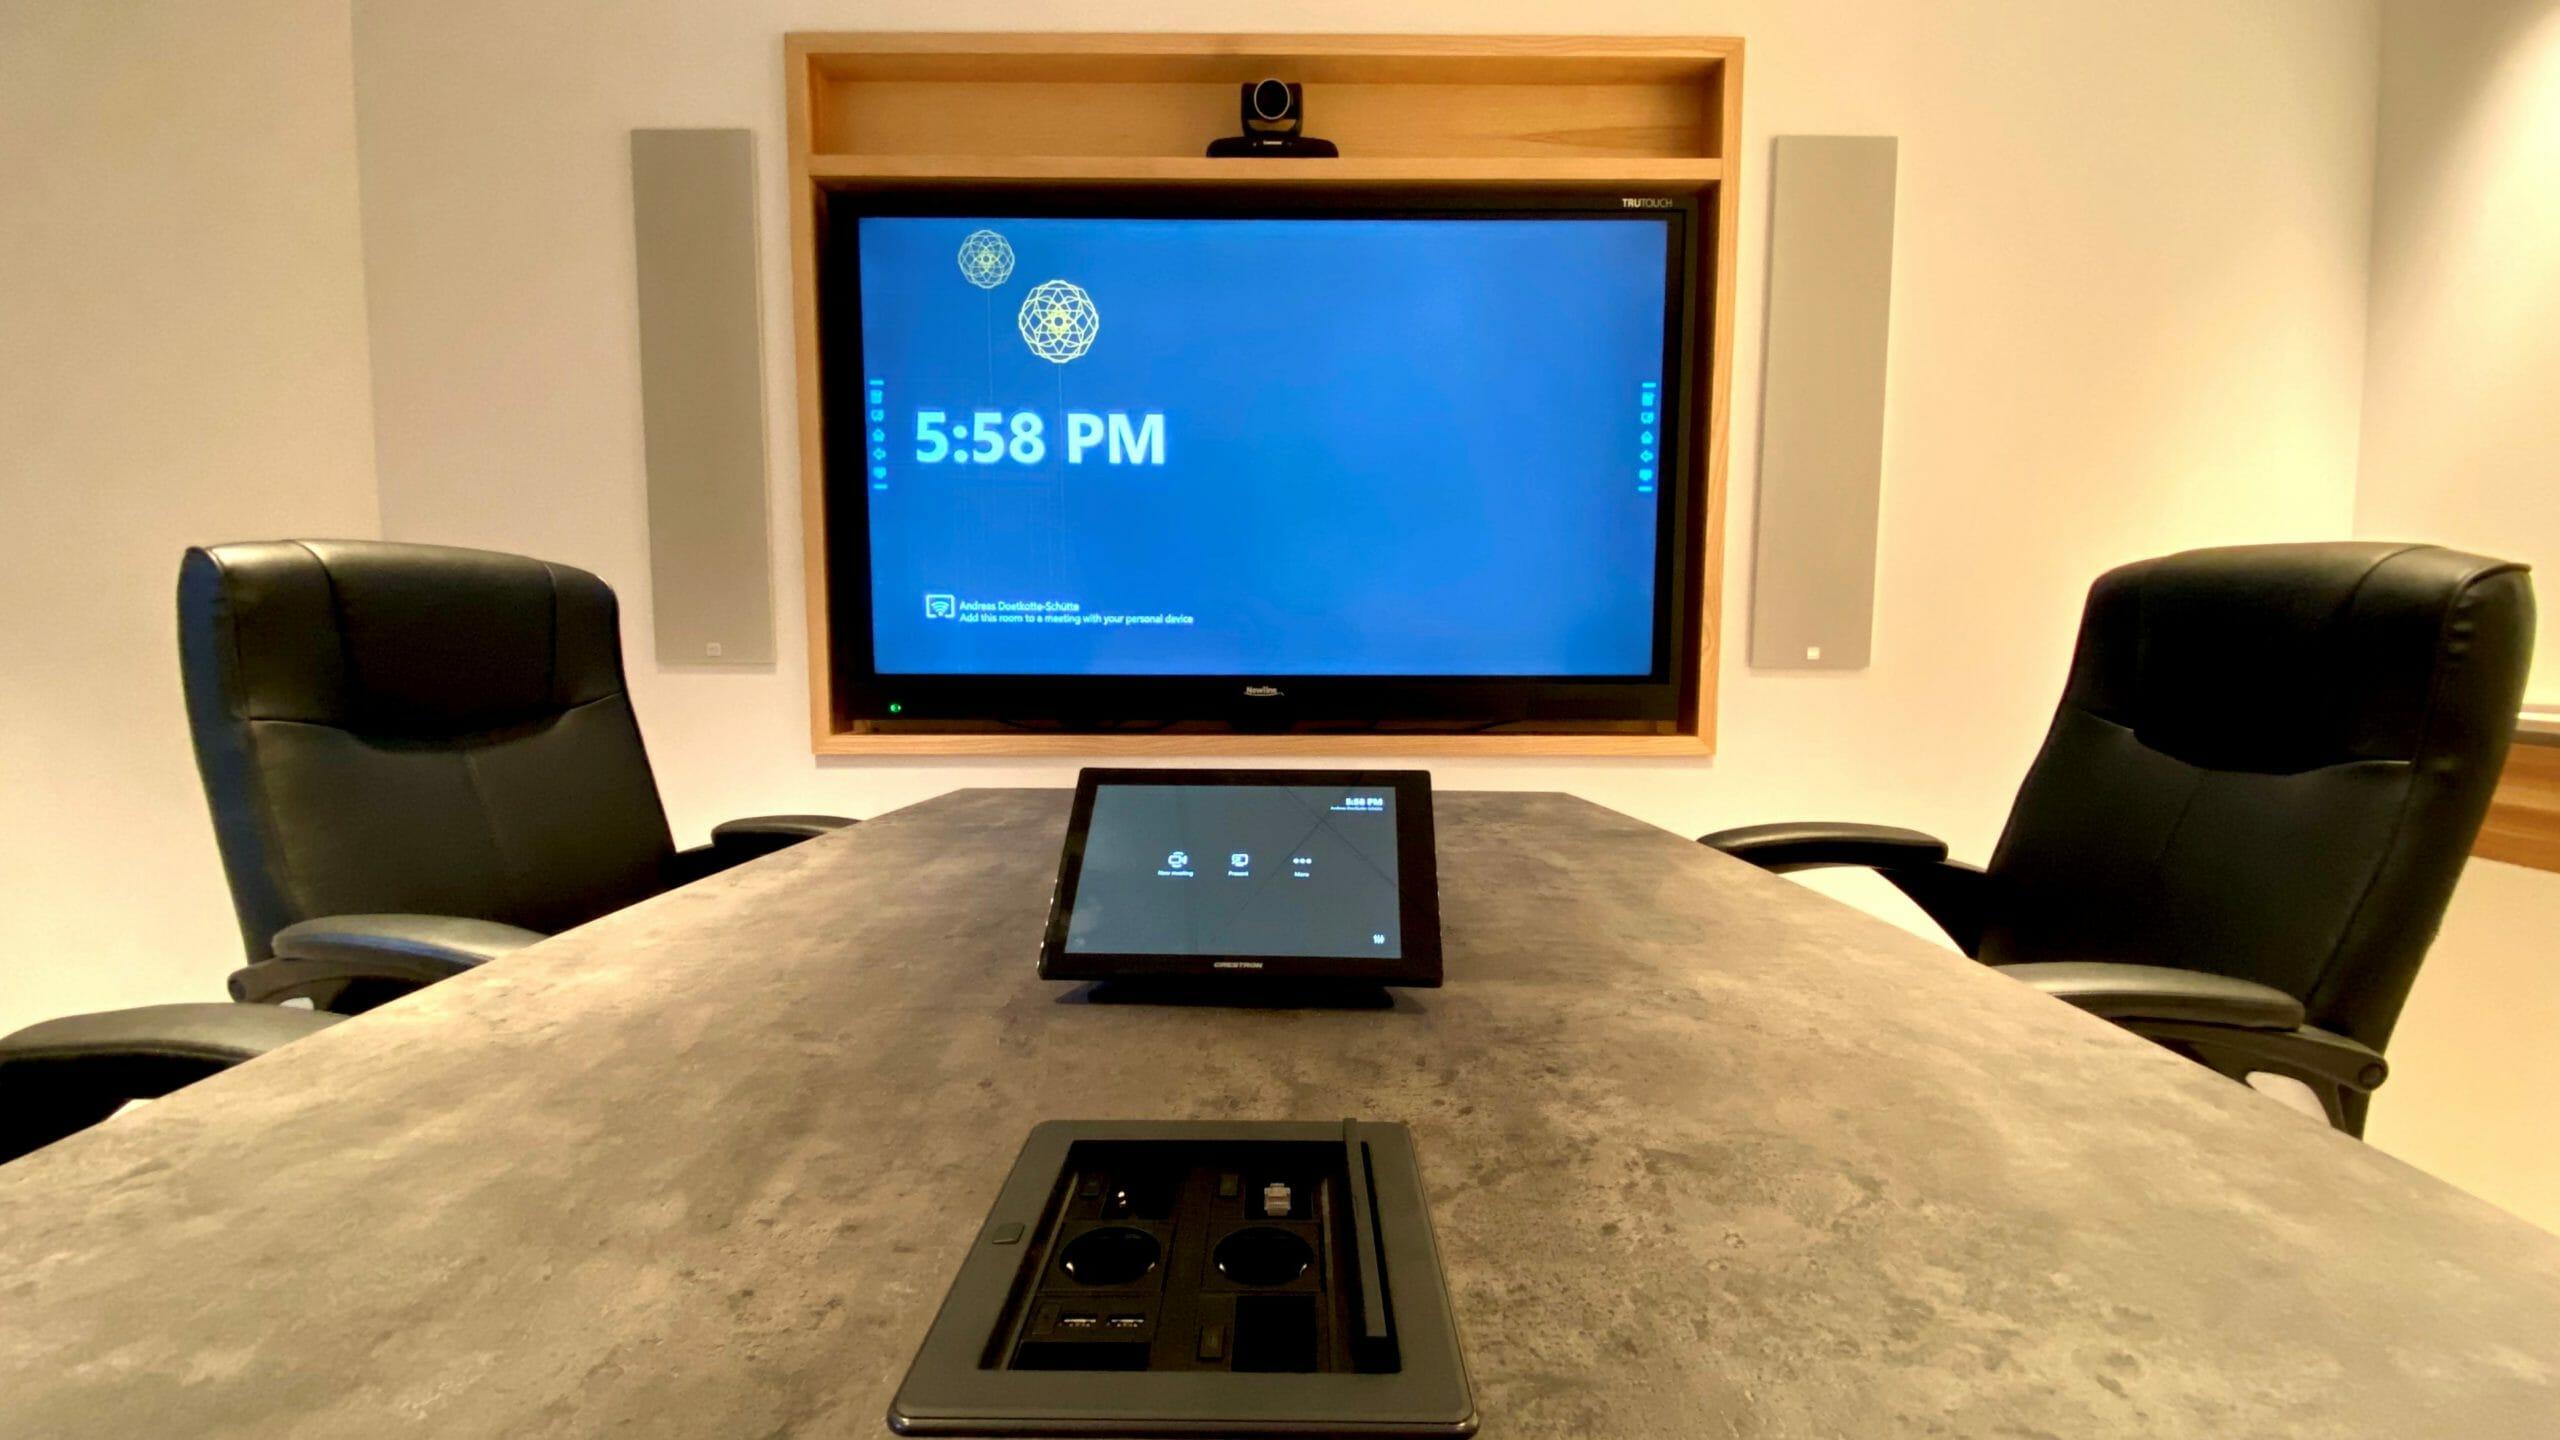 Videokonferenzsystem Crestron C-160-T im Showroom